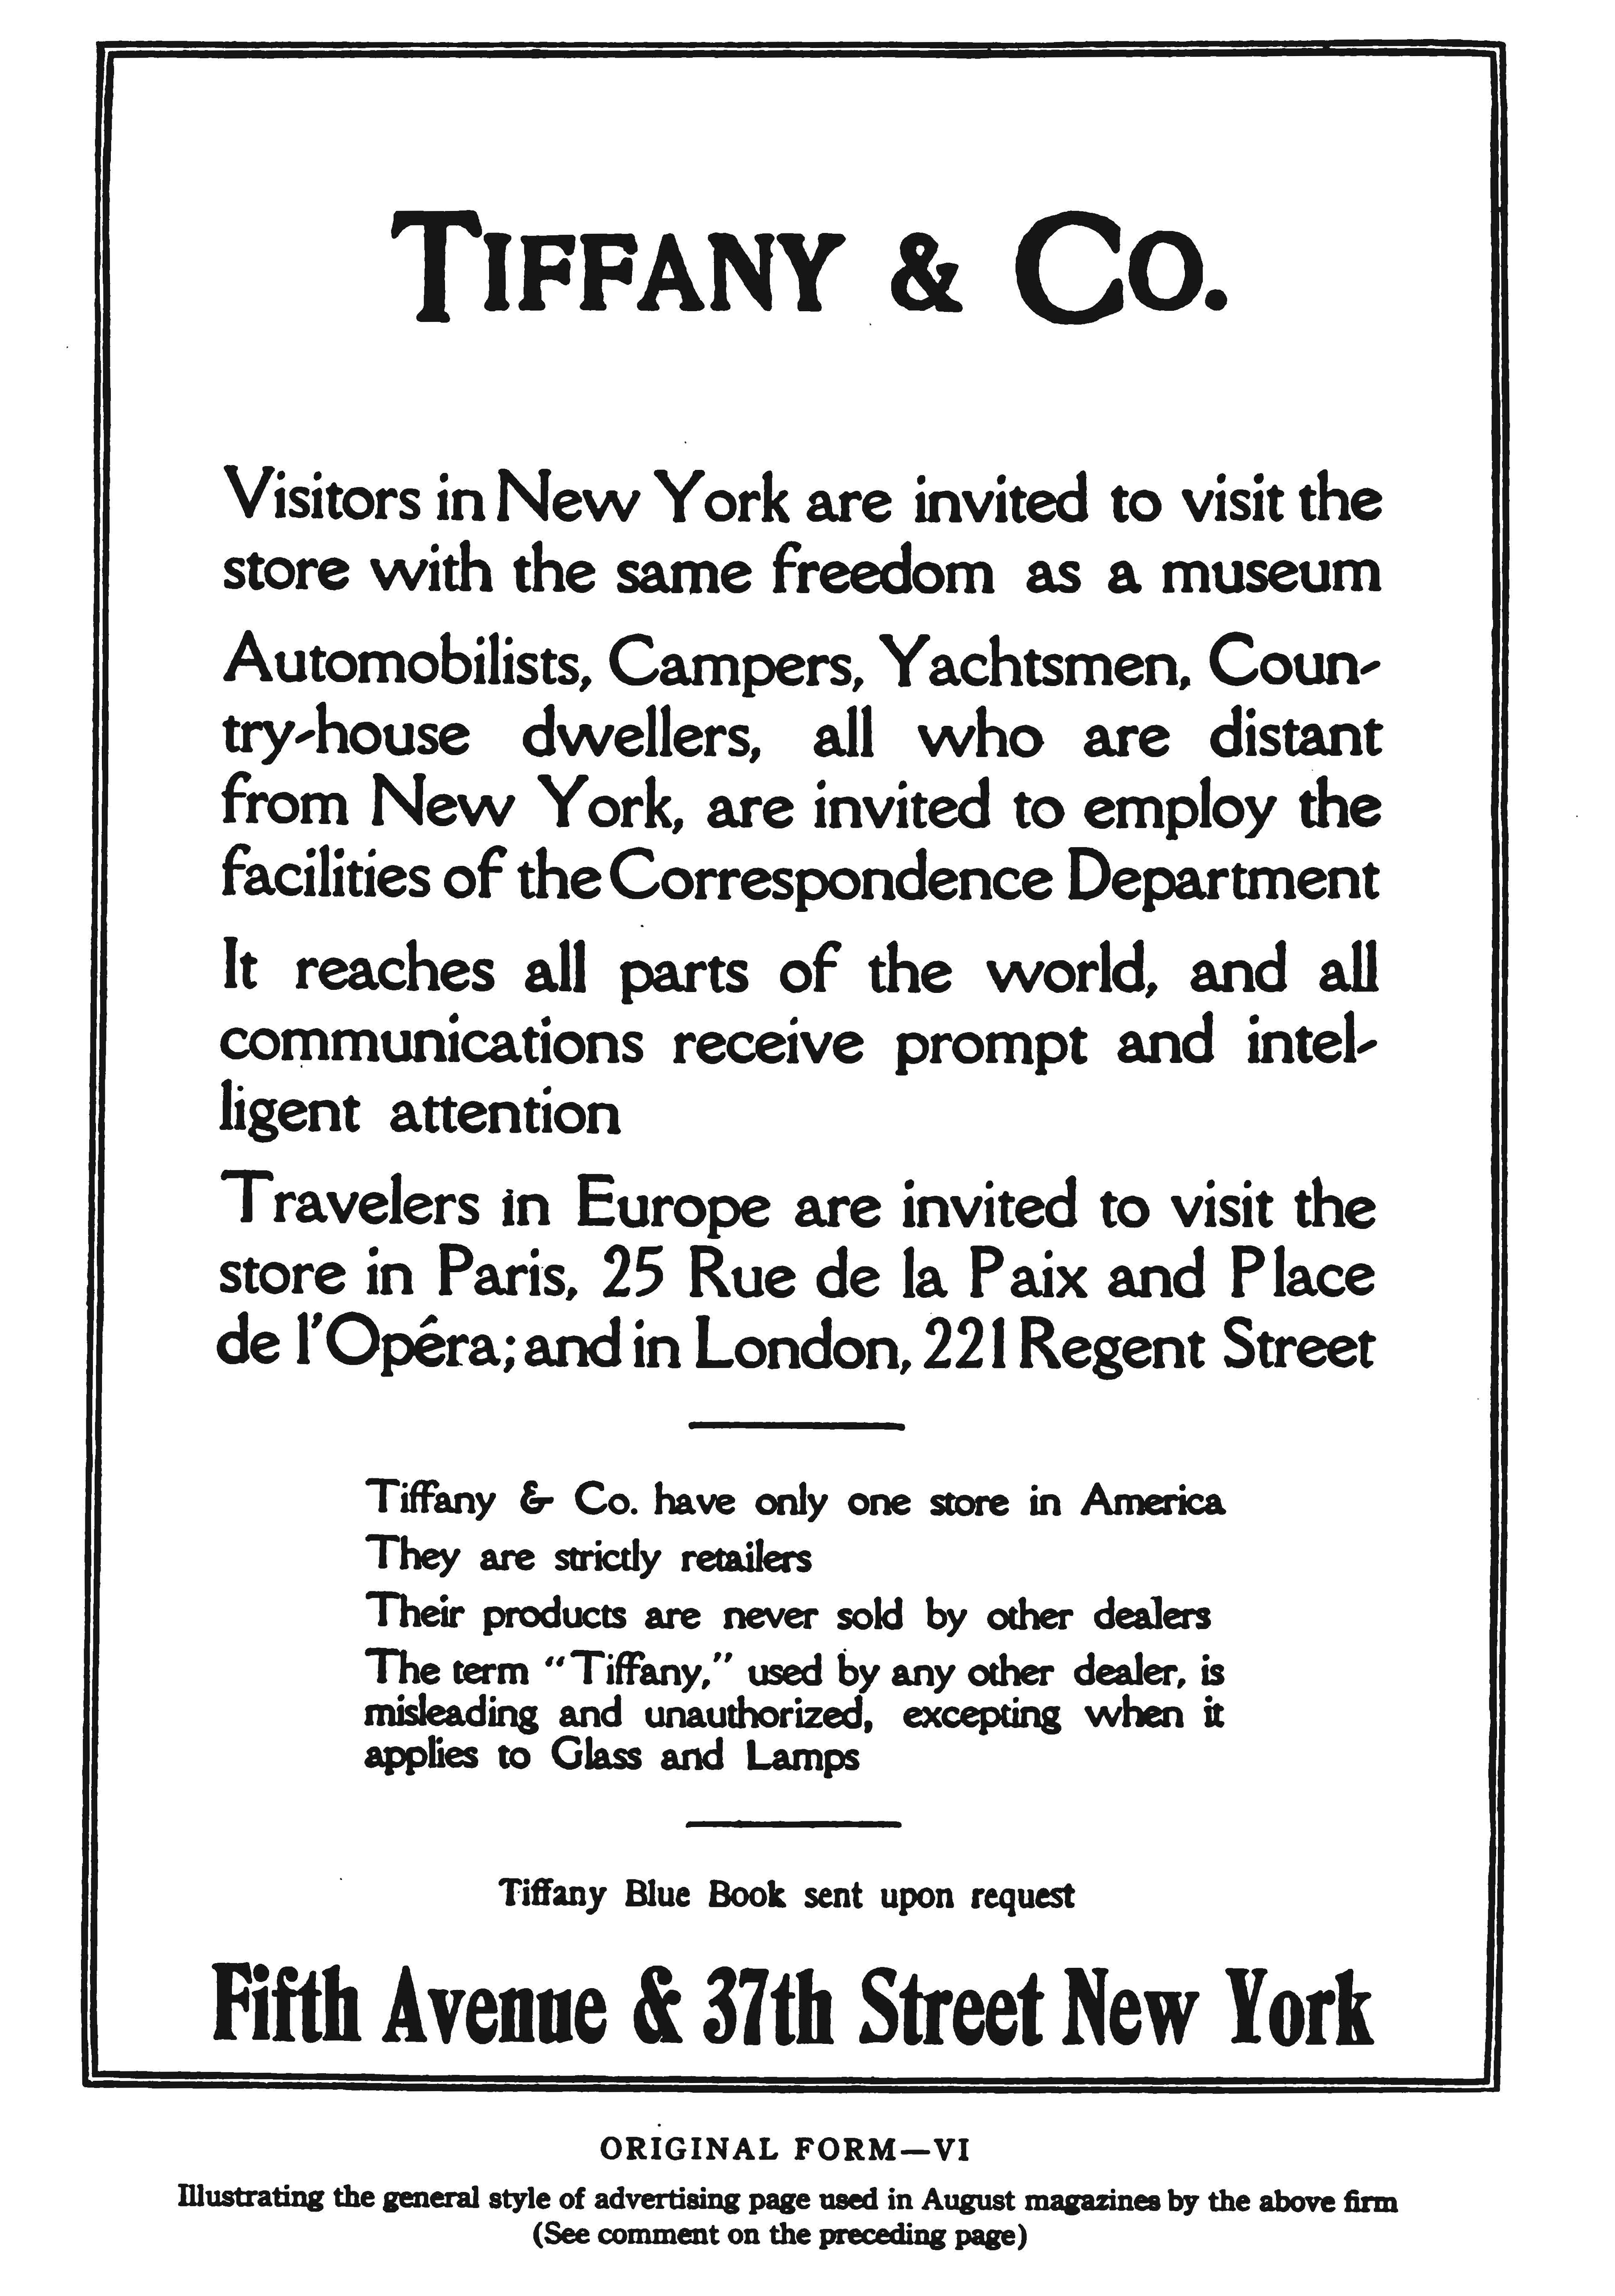 Original Tiffany & Co. advertisement